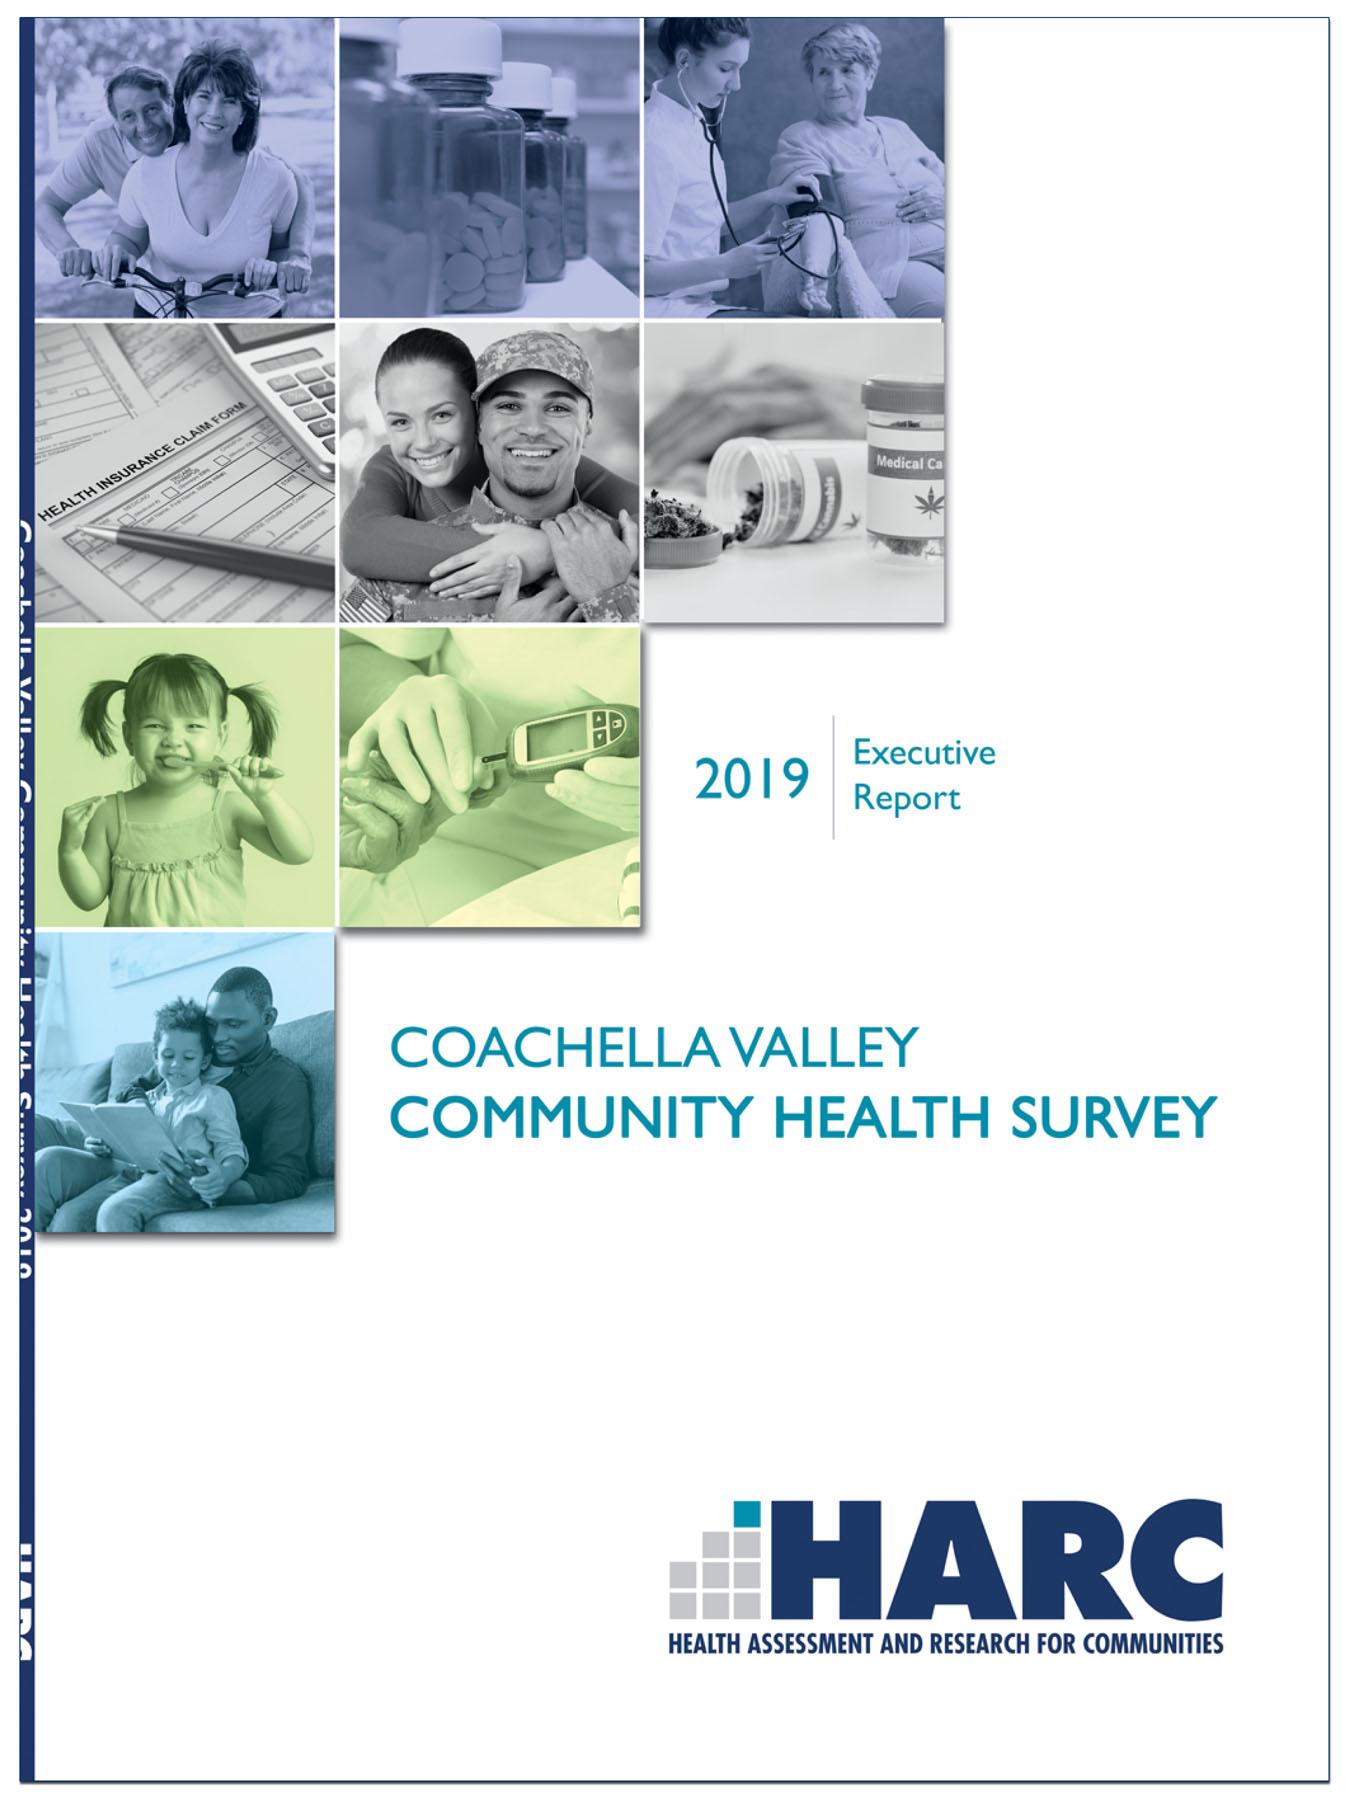 Coachella Valley Community Health Survey 2019